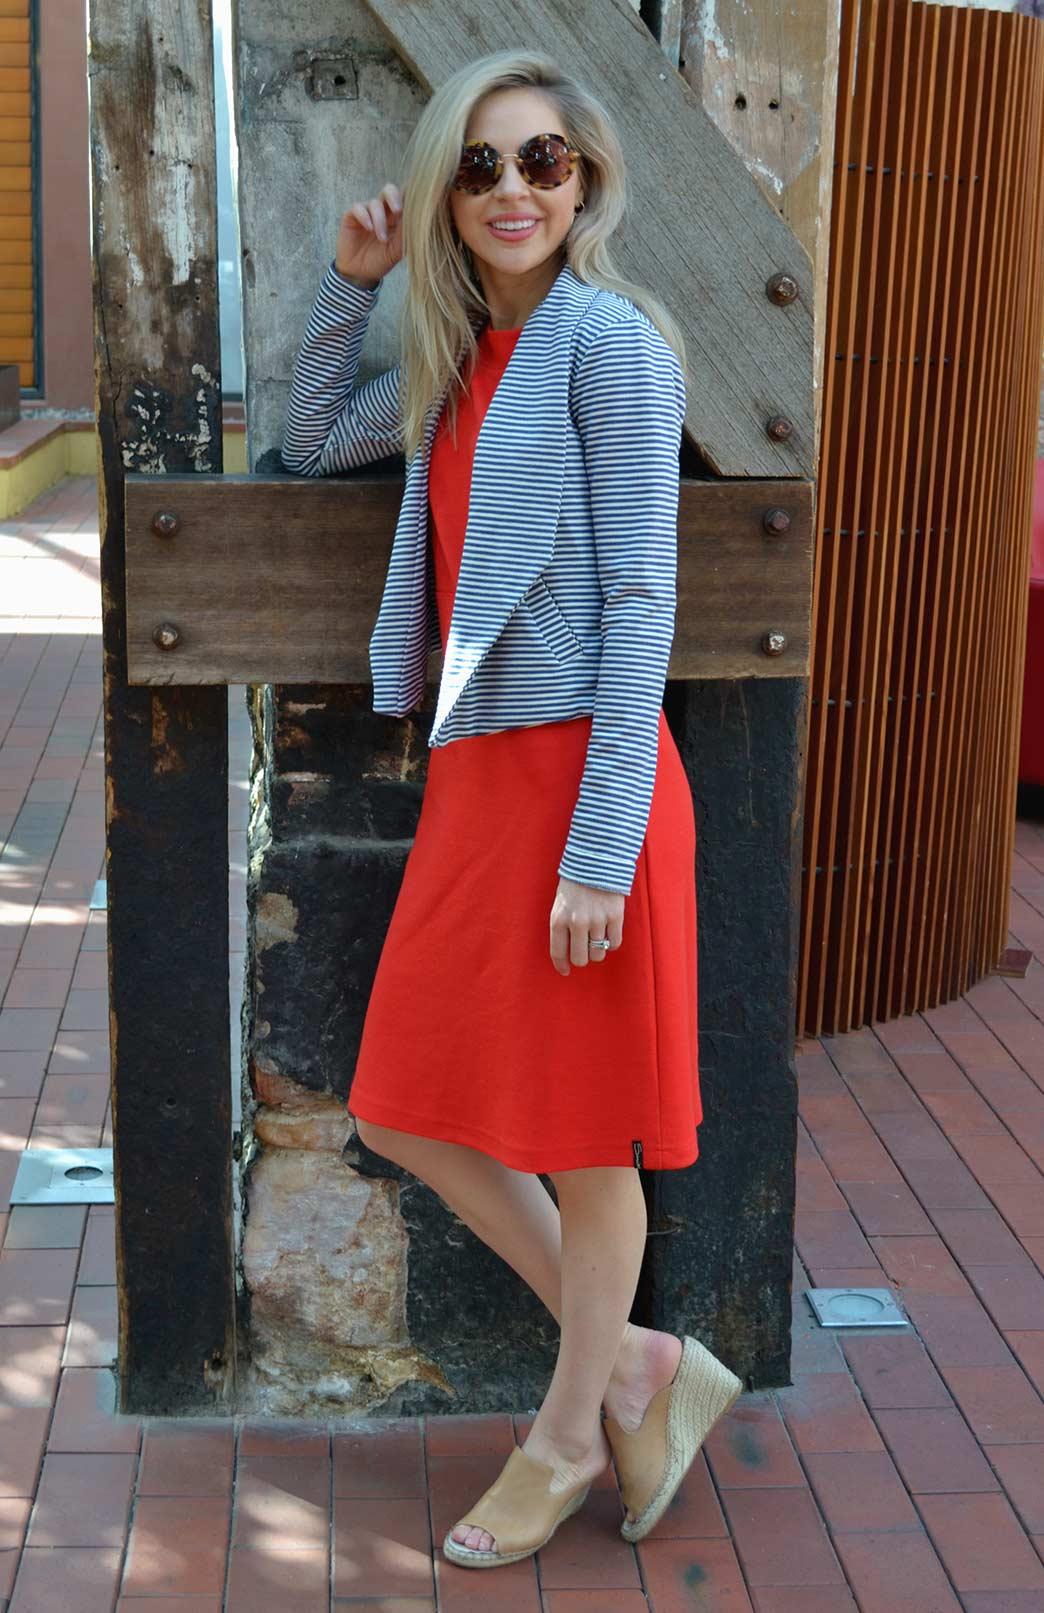 Lapel Jacket - Women's Merino Wool Organic Cotton Blend Striped Lapel - Smitten Merino Tasmania Australia